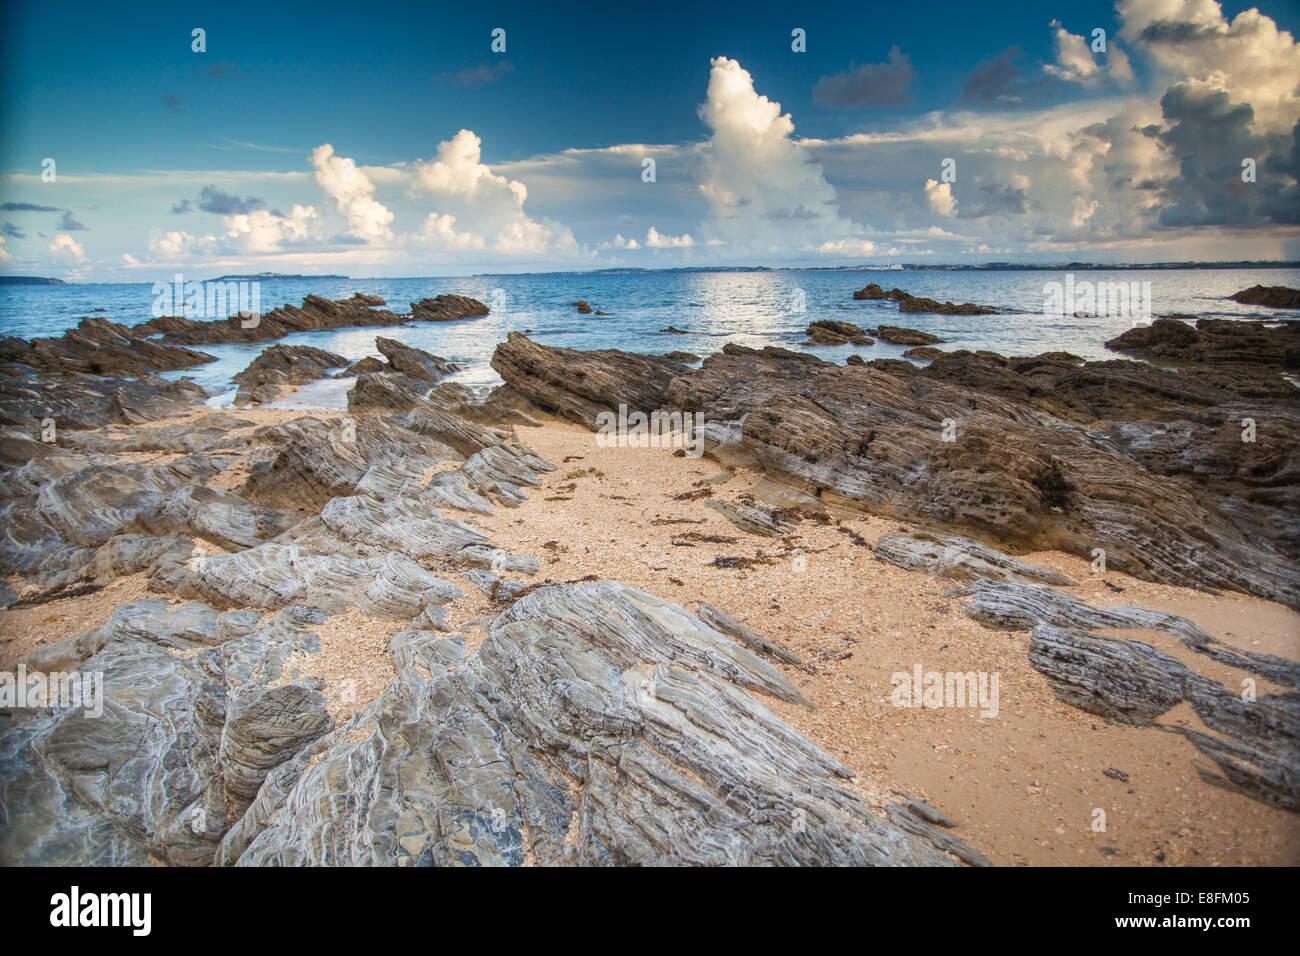 Japan, Okinawa, Rocks on Kin Beach - Stock Image